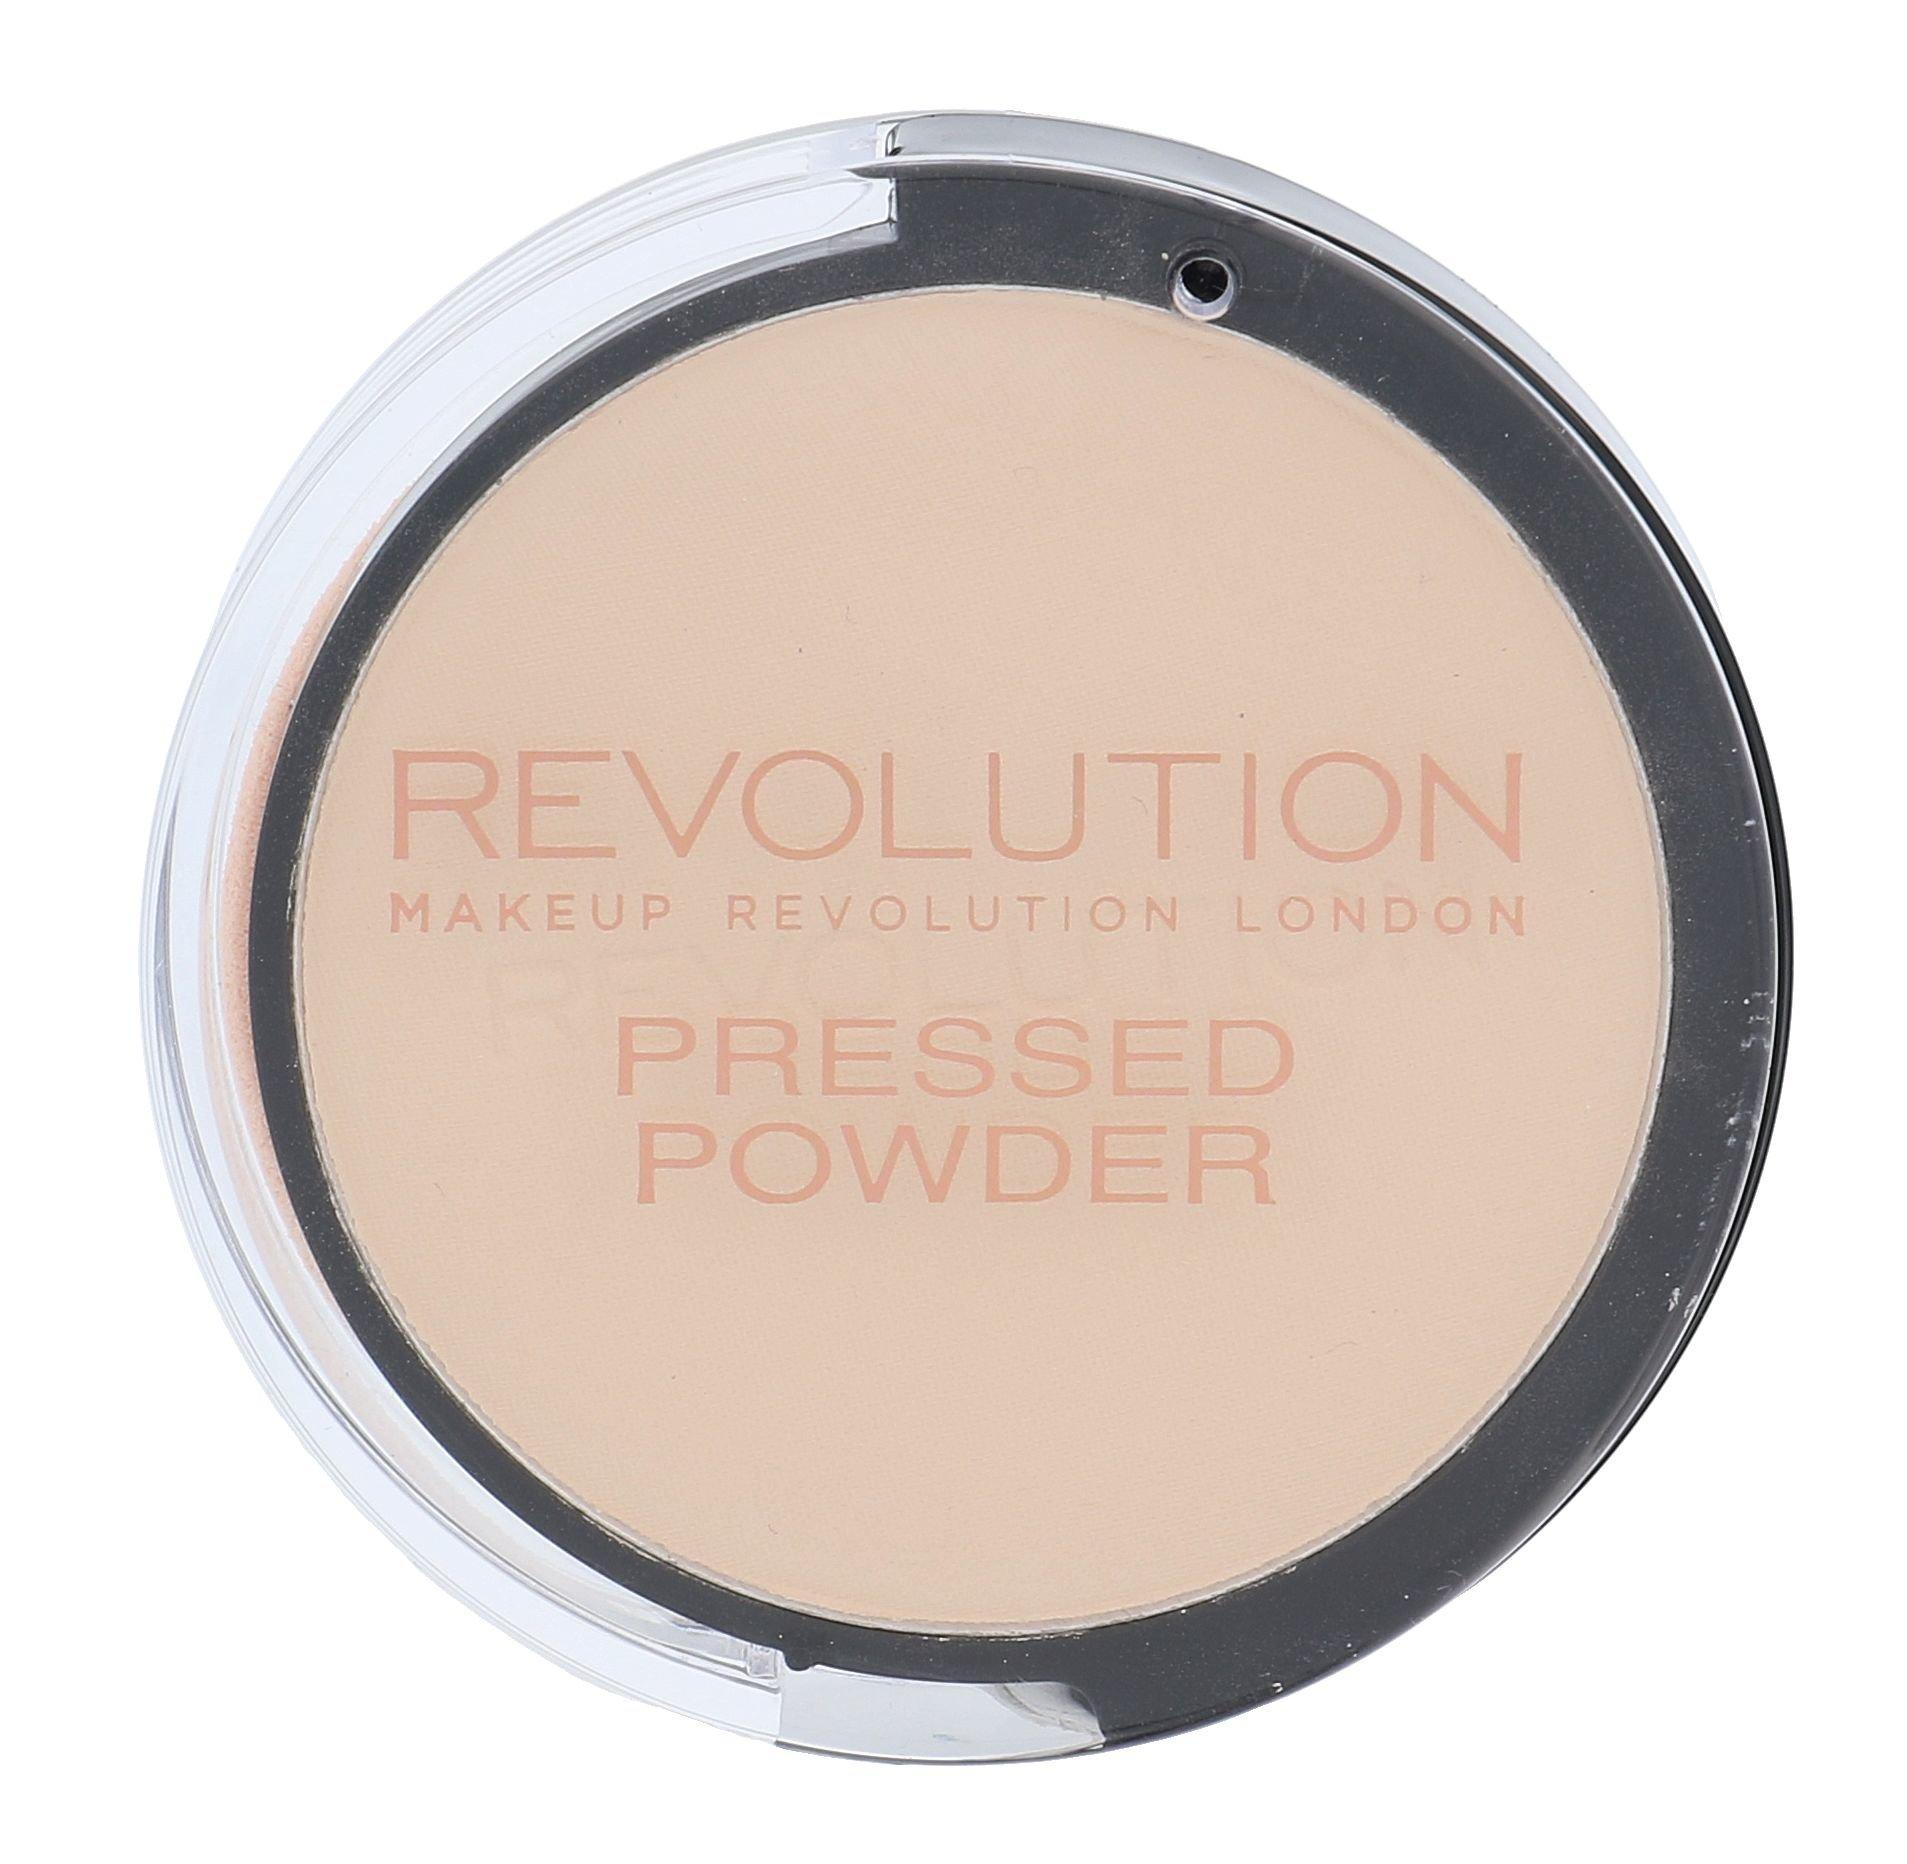 Makeup Revolution London Pressed Powder Cosmetic 7,5g Translucent